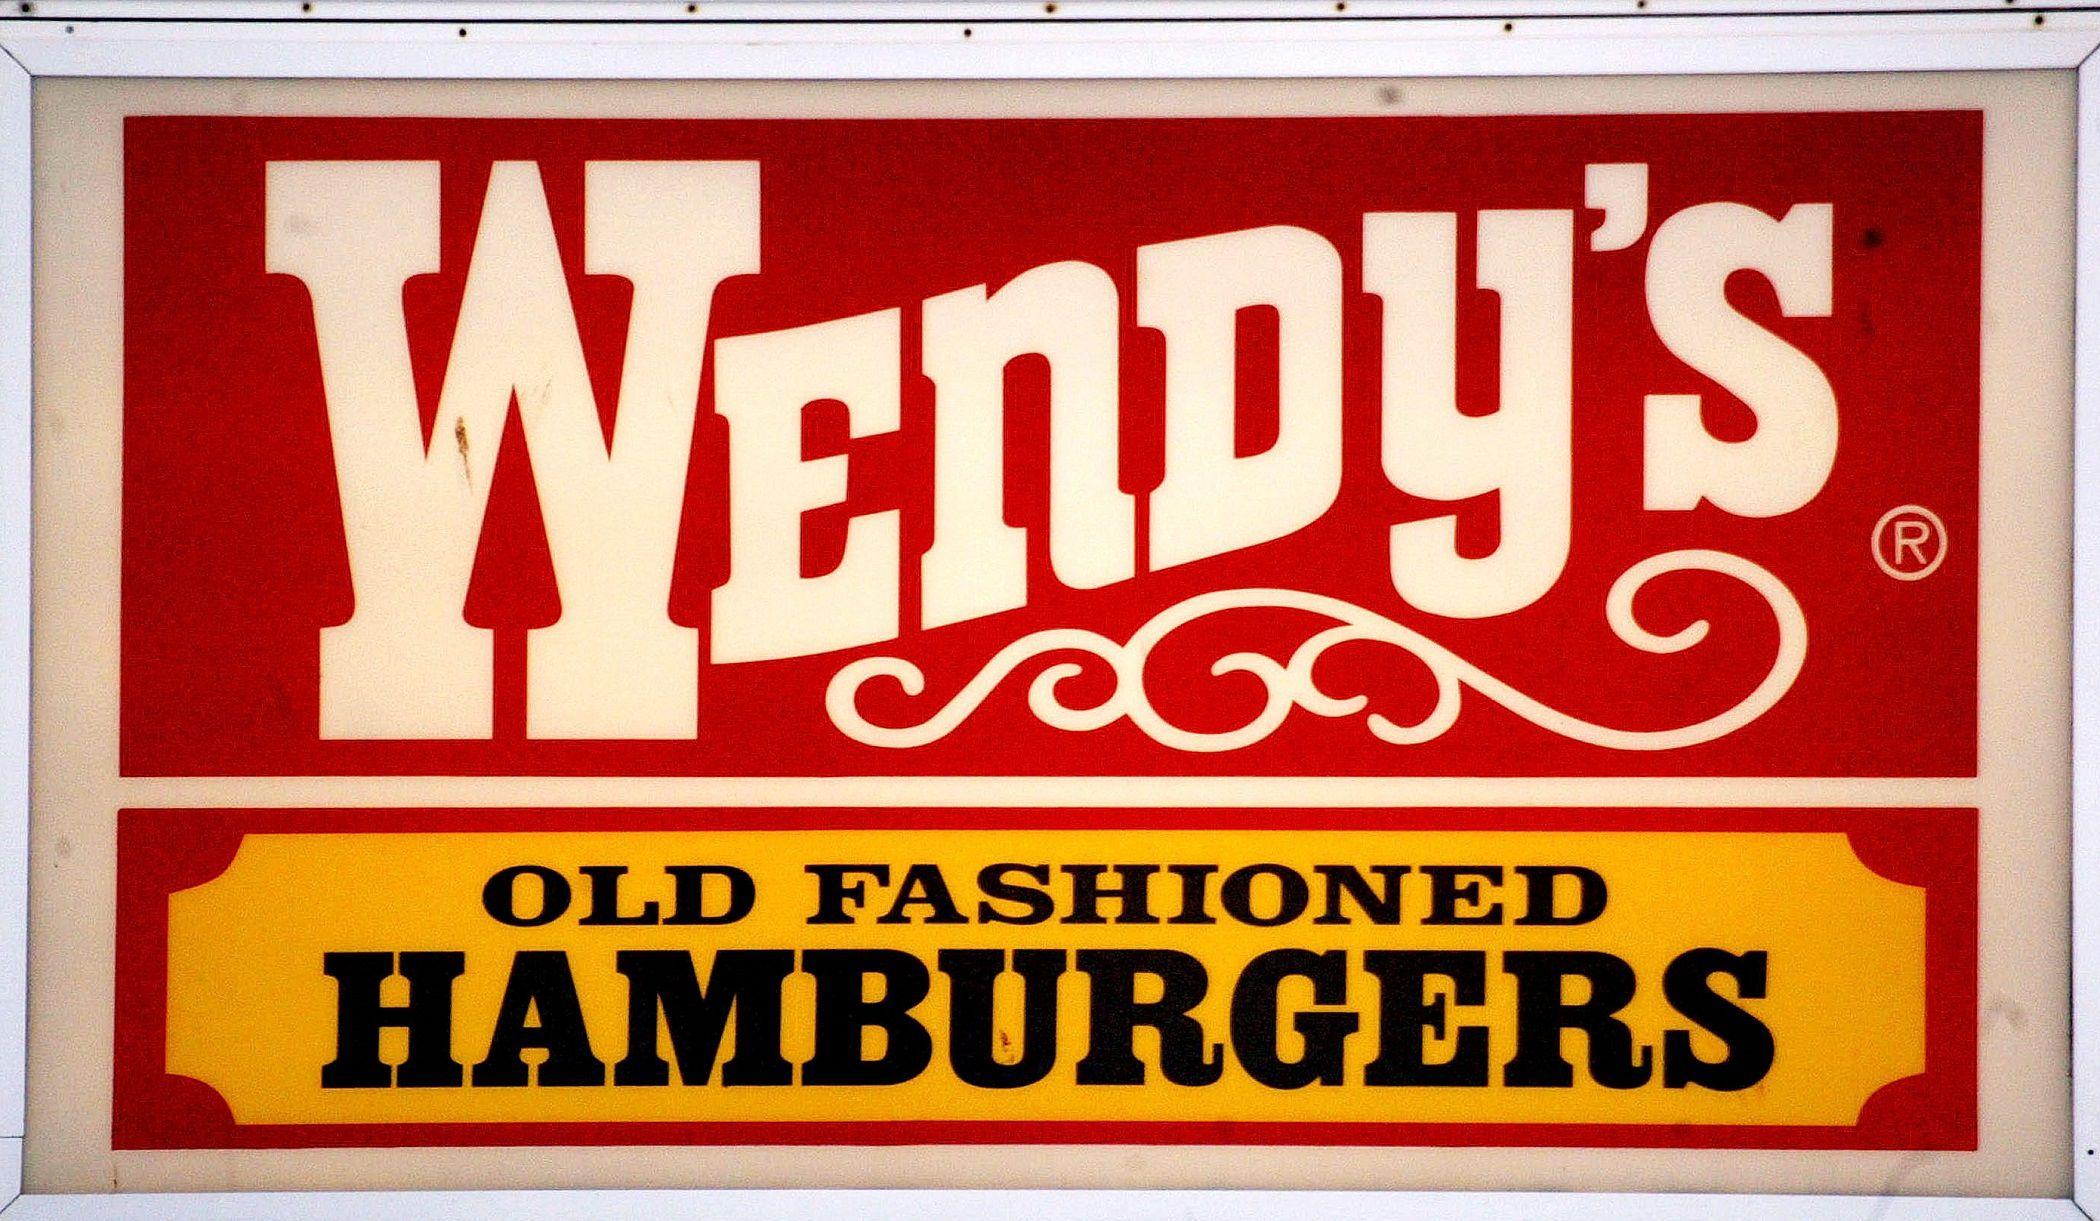 Carbs in wendy's single hamburger